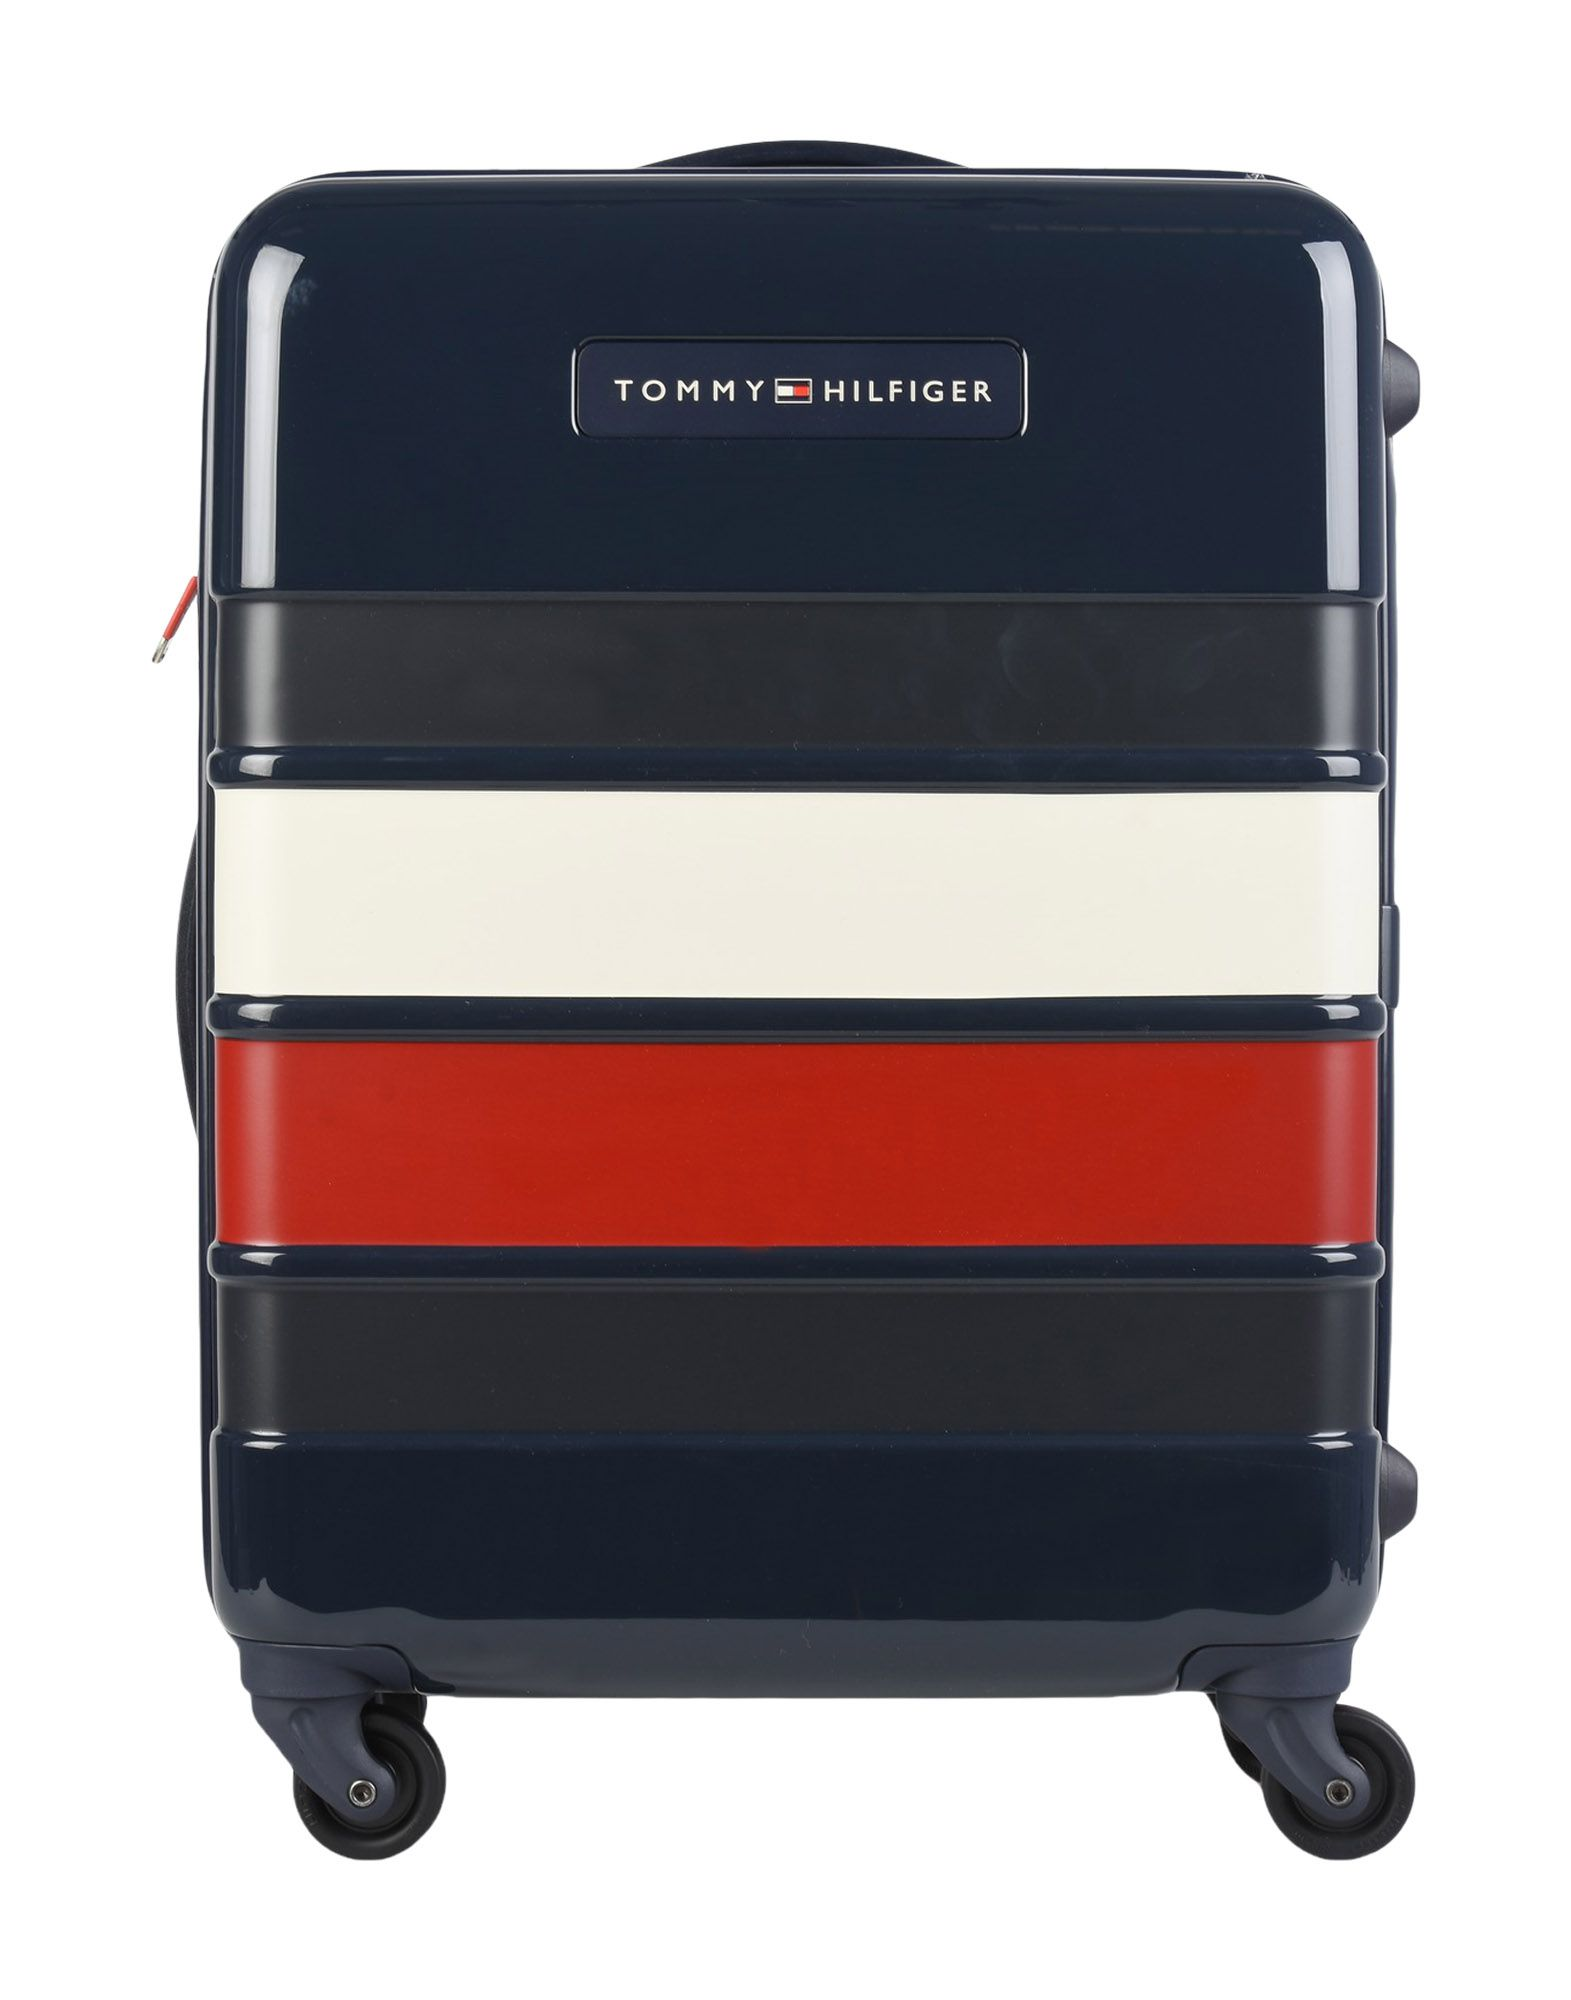 TOMMY HILFIGER Чемодан/сумка на колесиках сумка tommy hilfiger am0am00806 002 black